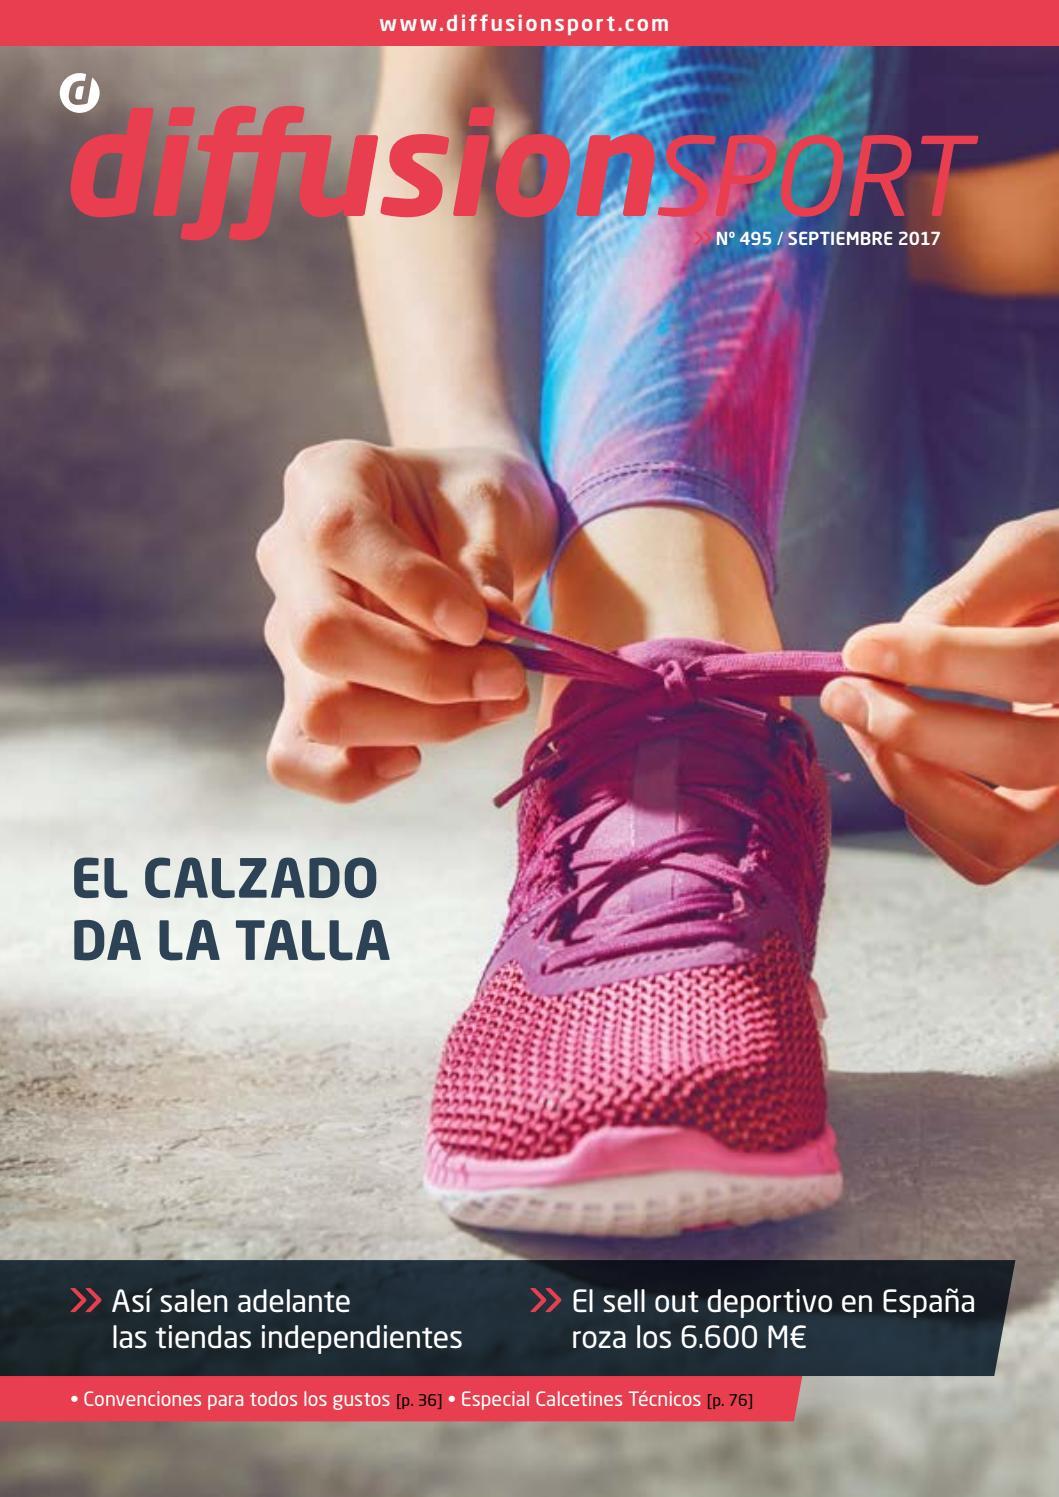 zapatillas mizuno hombre 2019 xunta ni�a largo